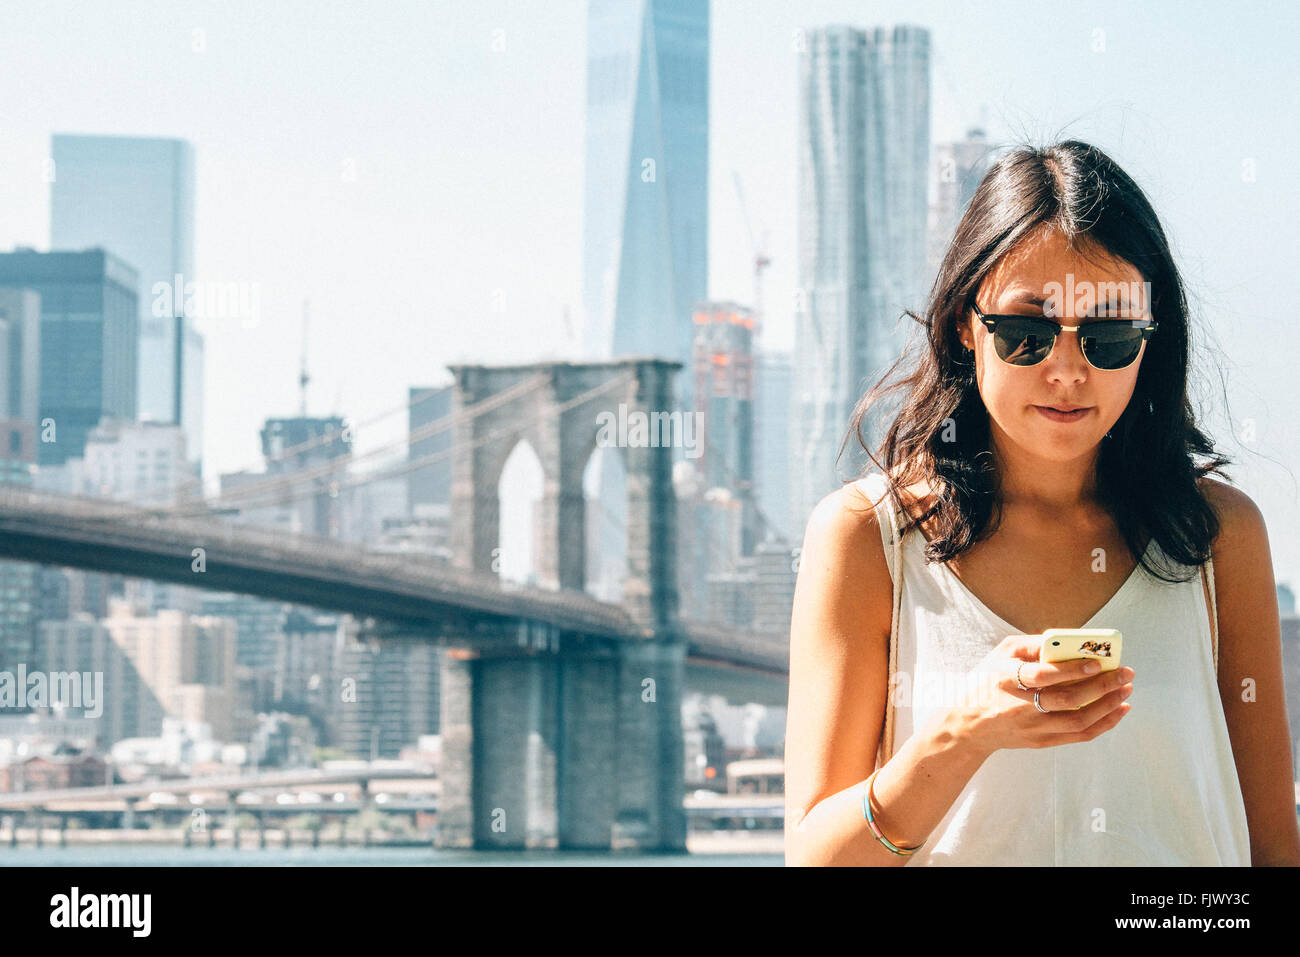 Junge Frau mit Smartphone gegen Brooklyn Bridge Stockfoto